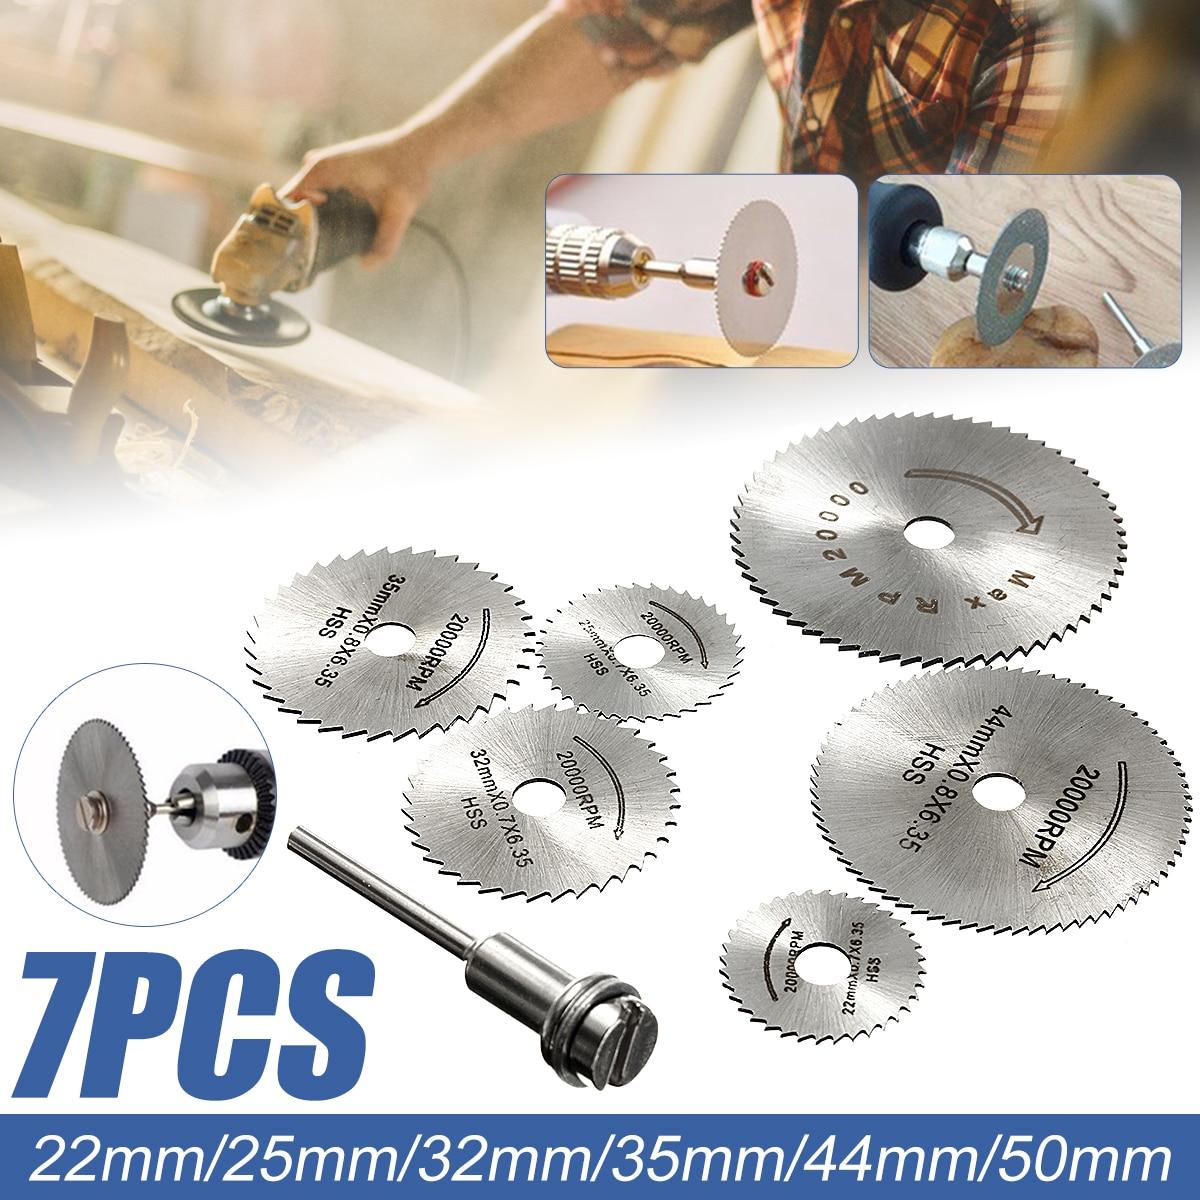 6Pcs HSS Circular Saw Blade + 1Pcs HSS Circular Rotary Blade Wheel Discs Mandrel For Wood Cutting Saws Tool Accessories Kit